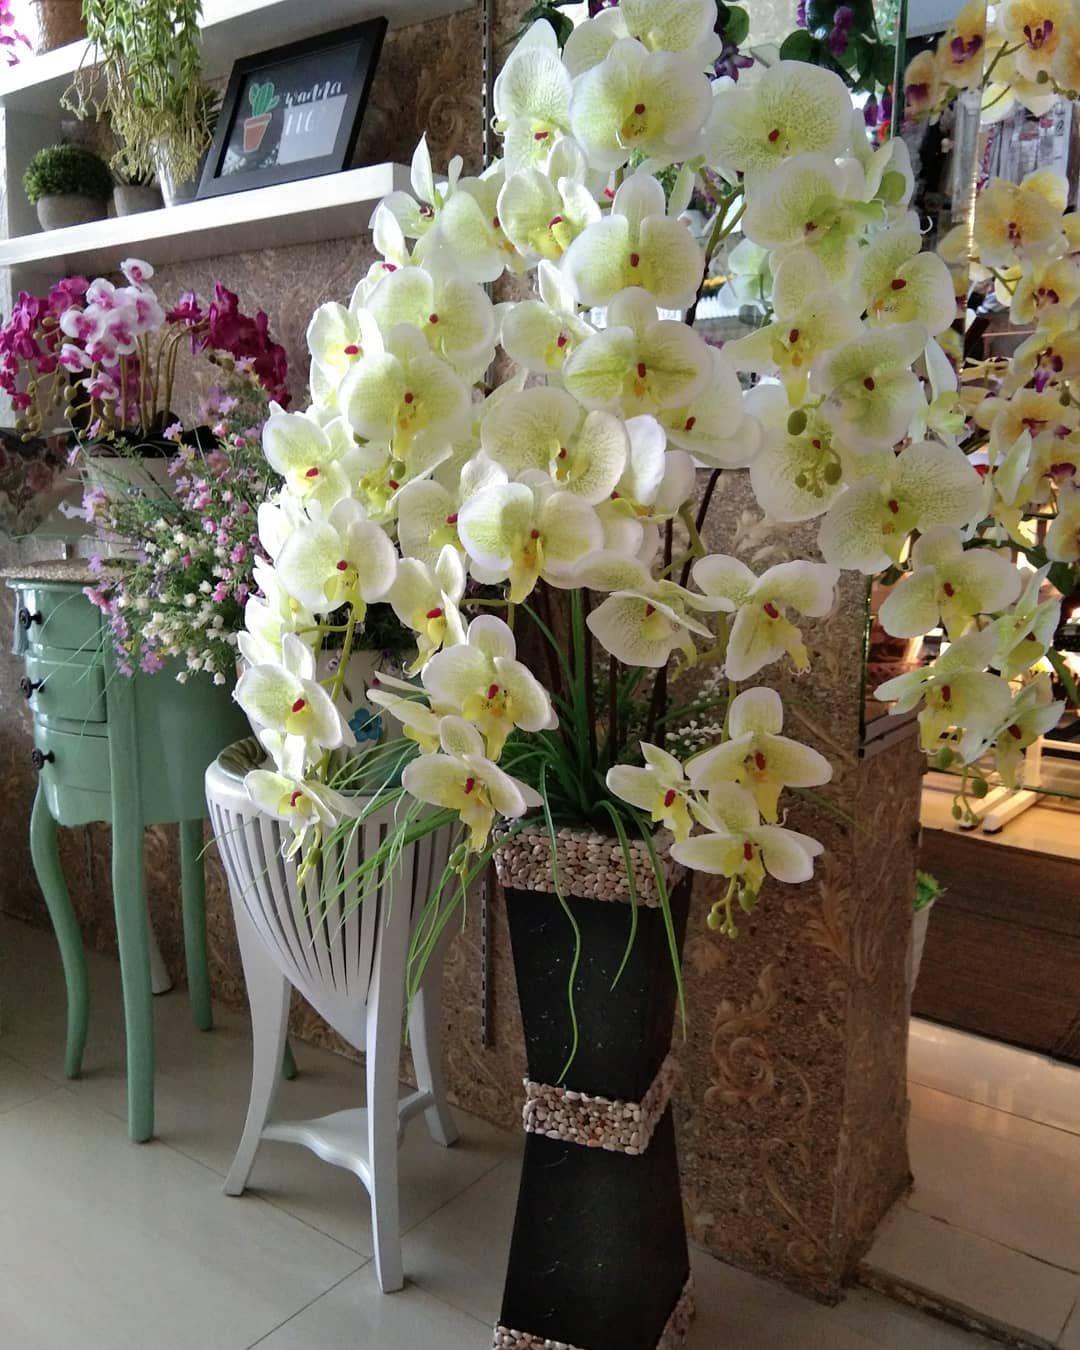 New The 10 Best Home Decor With Pictures Bismilah Bunga Anggrek Cantik Buat D Sudut Ruangan Y Moms Order Wa 0822 Home Decor Decor Decor Interior Design